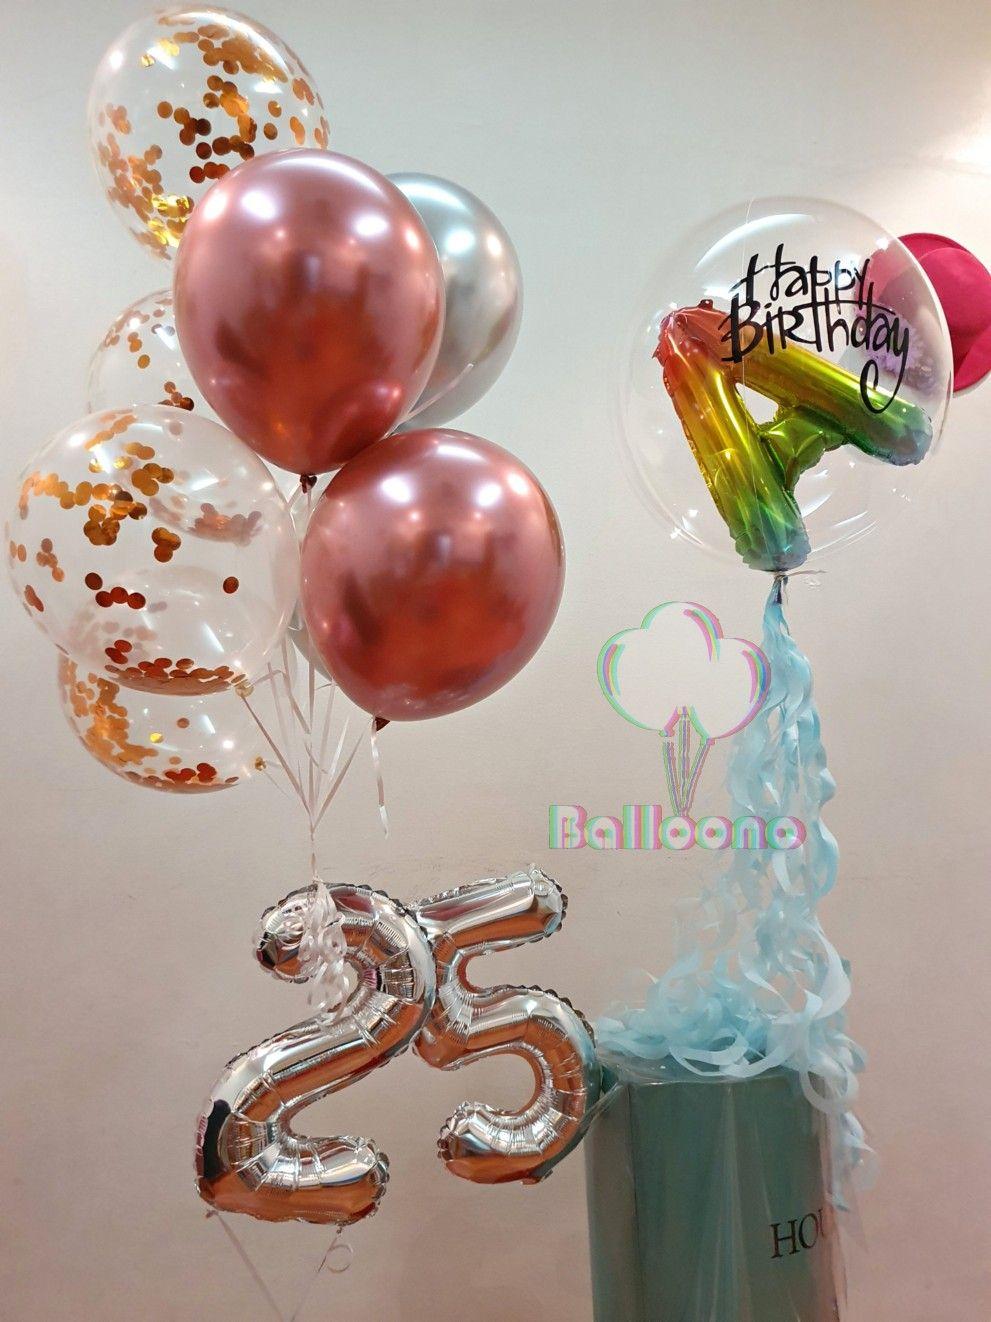 Birthday Party Balloons Birthday Party Balloon Balloons Transparent Balloons